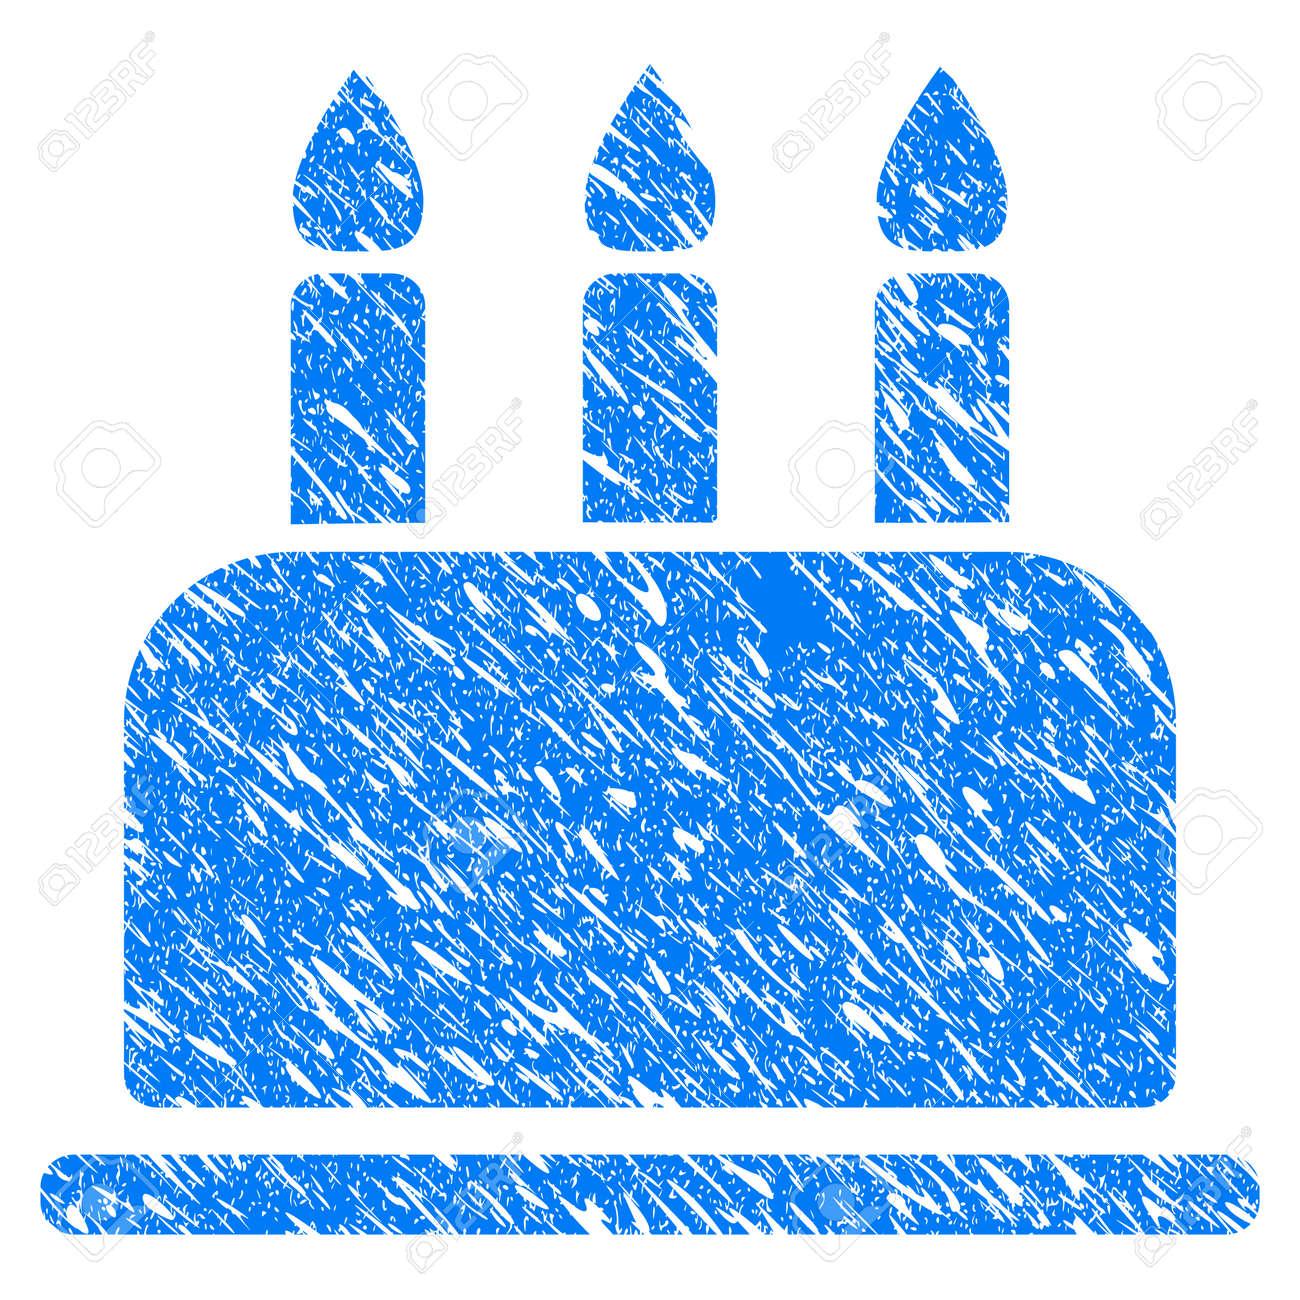 Grunge Birthday Cake Icon With Grunge Design And Dust Texture